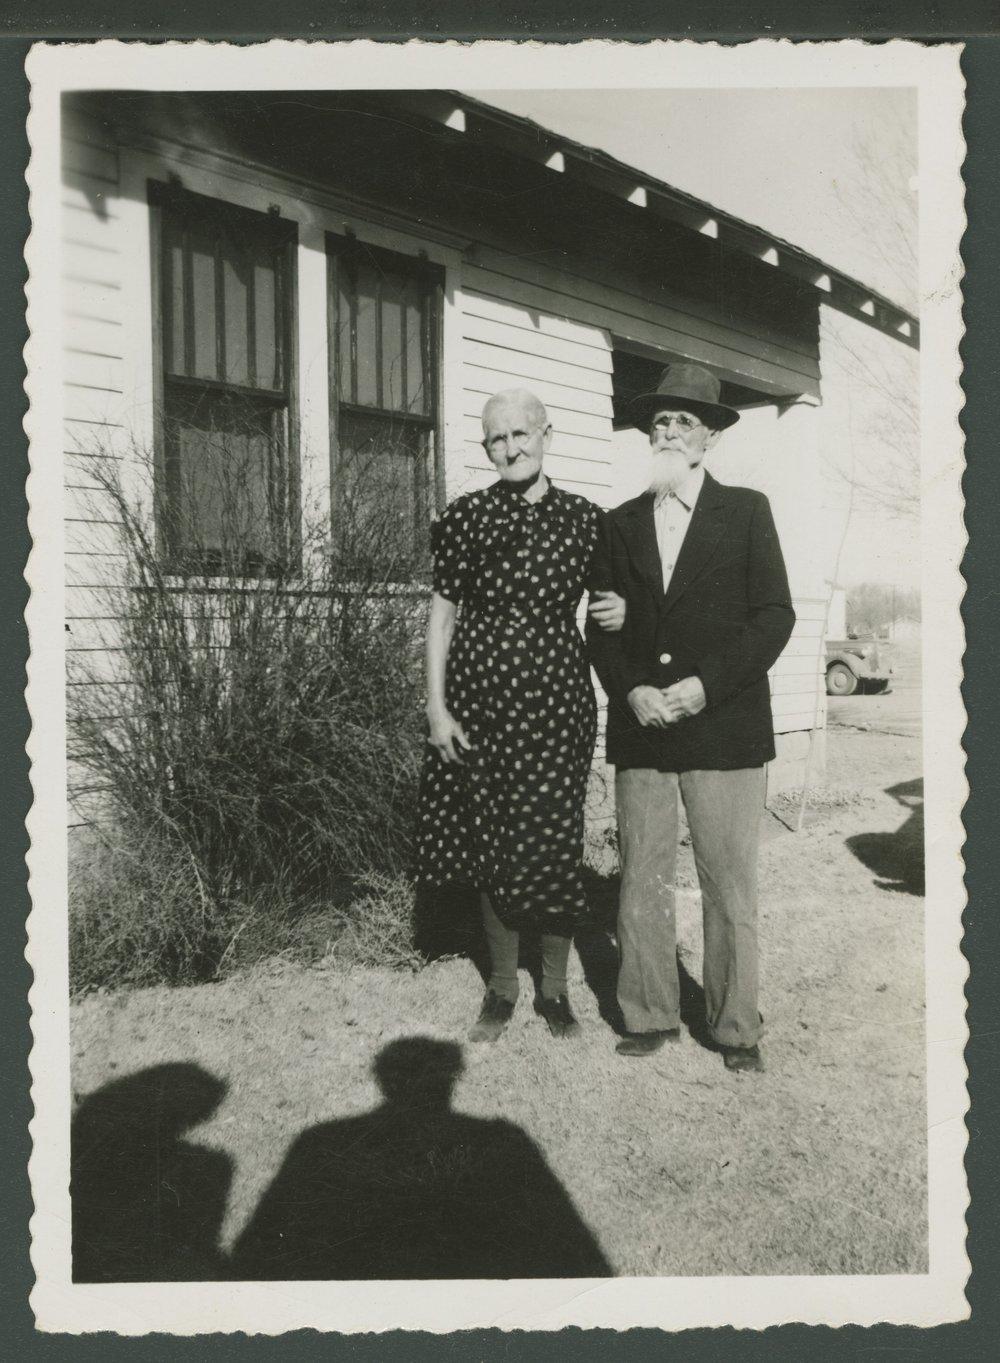 Alexander and Allie McCoid, Liberal, Kansas